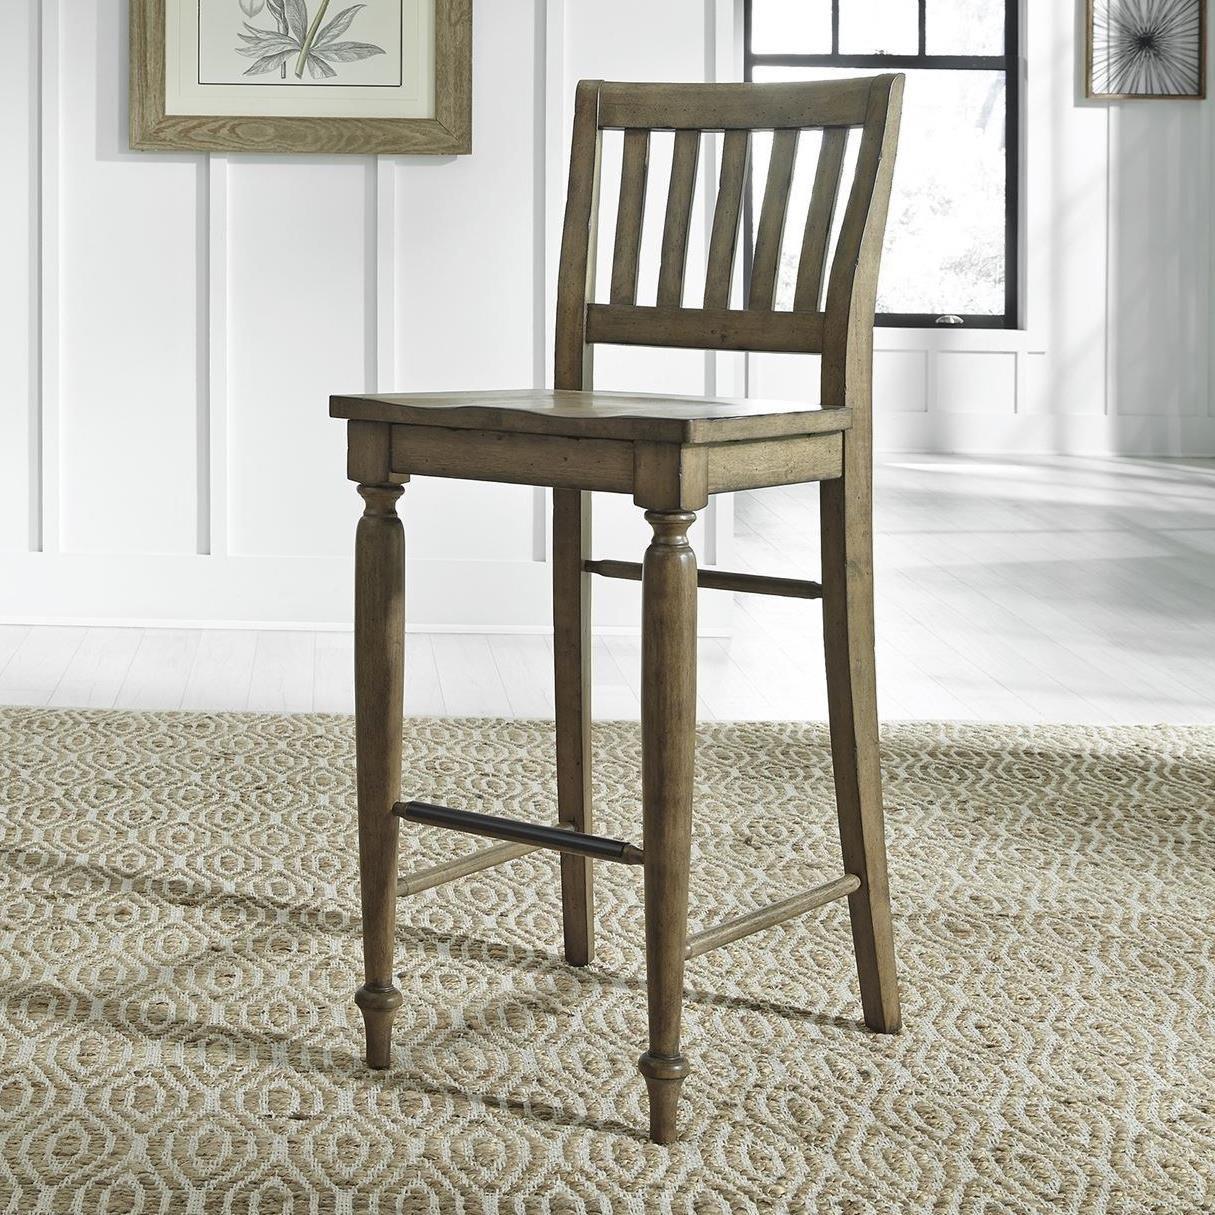 Liberty Furniture Harvest Home Relaxed Vintage Slat Back Bar Stool Royal Furniture Bar Stools